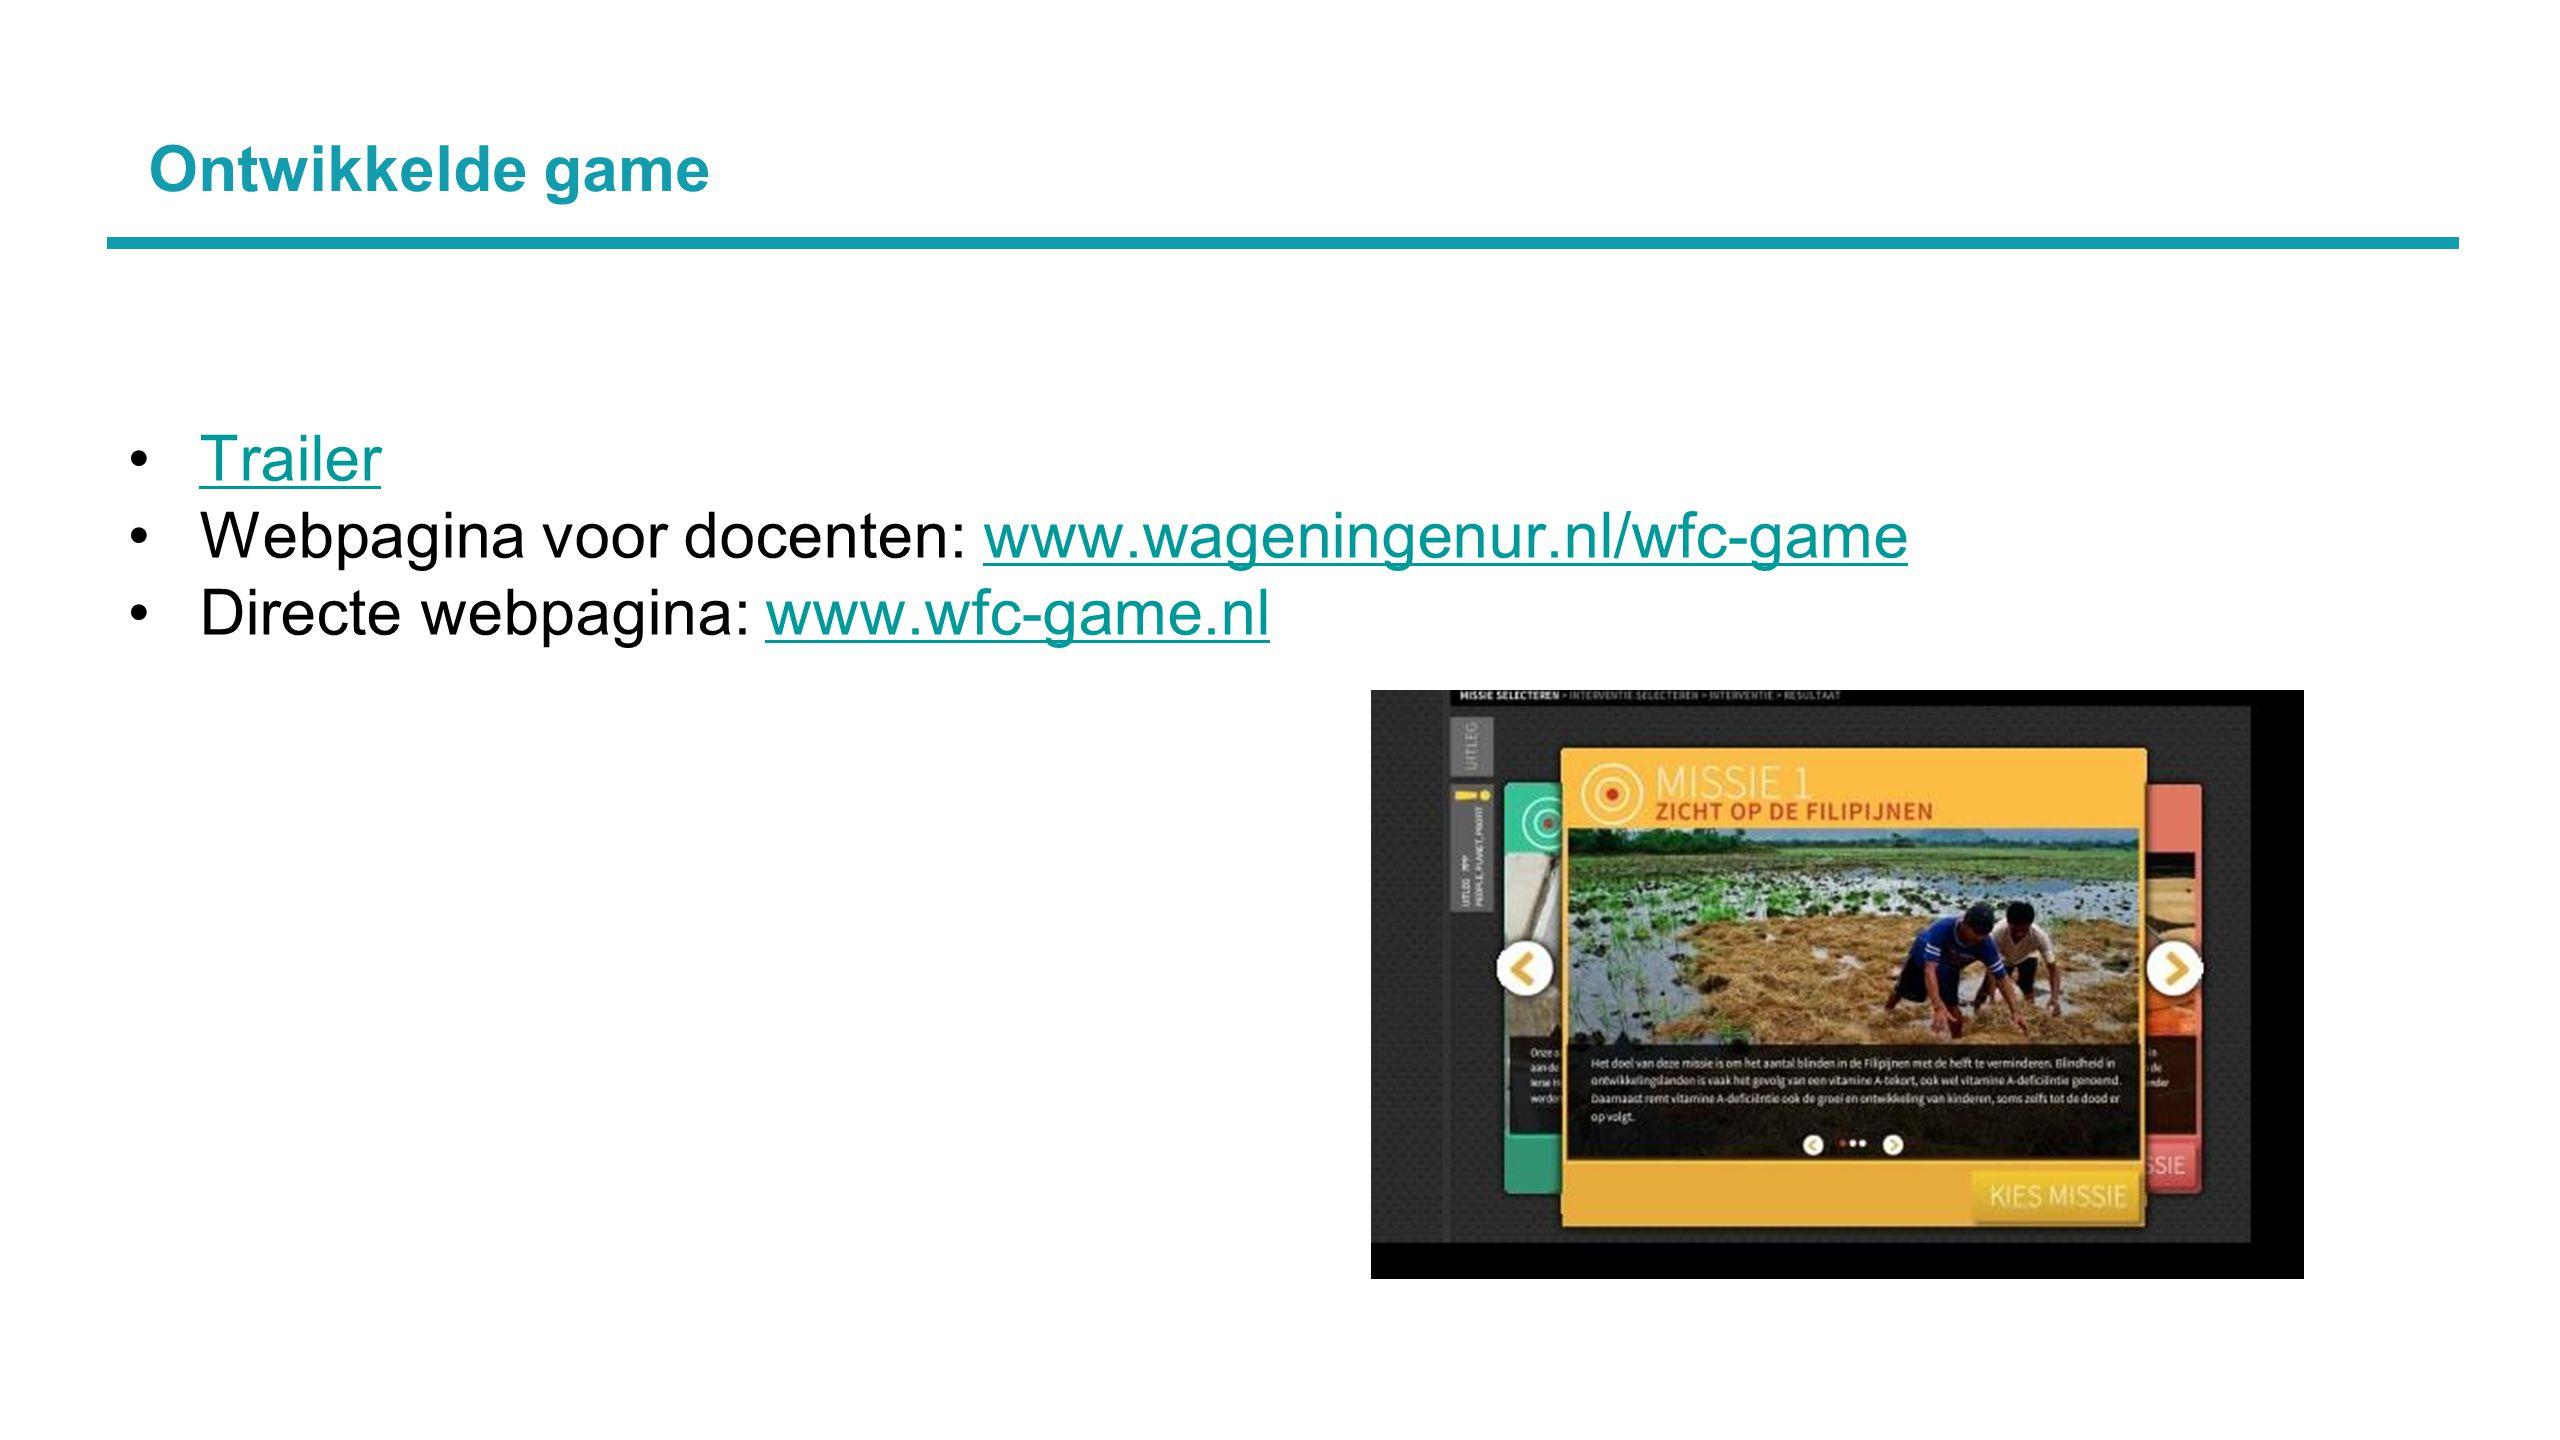 Ontwikkelde game Trailer Webpagina voor docenten: www.wageningenur.nl/wfc-gamewww.wageningenur.nl/wfc-game Directe webpagina: www.wfc-game.nlwww.wfc-game.nl